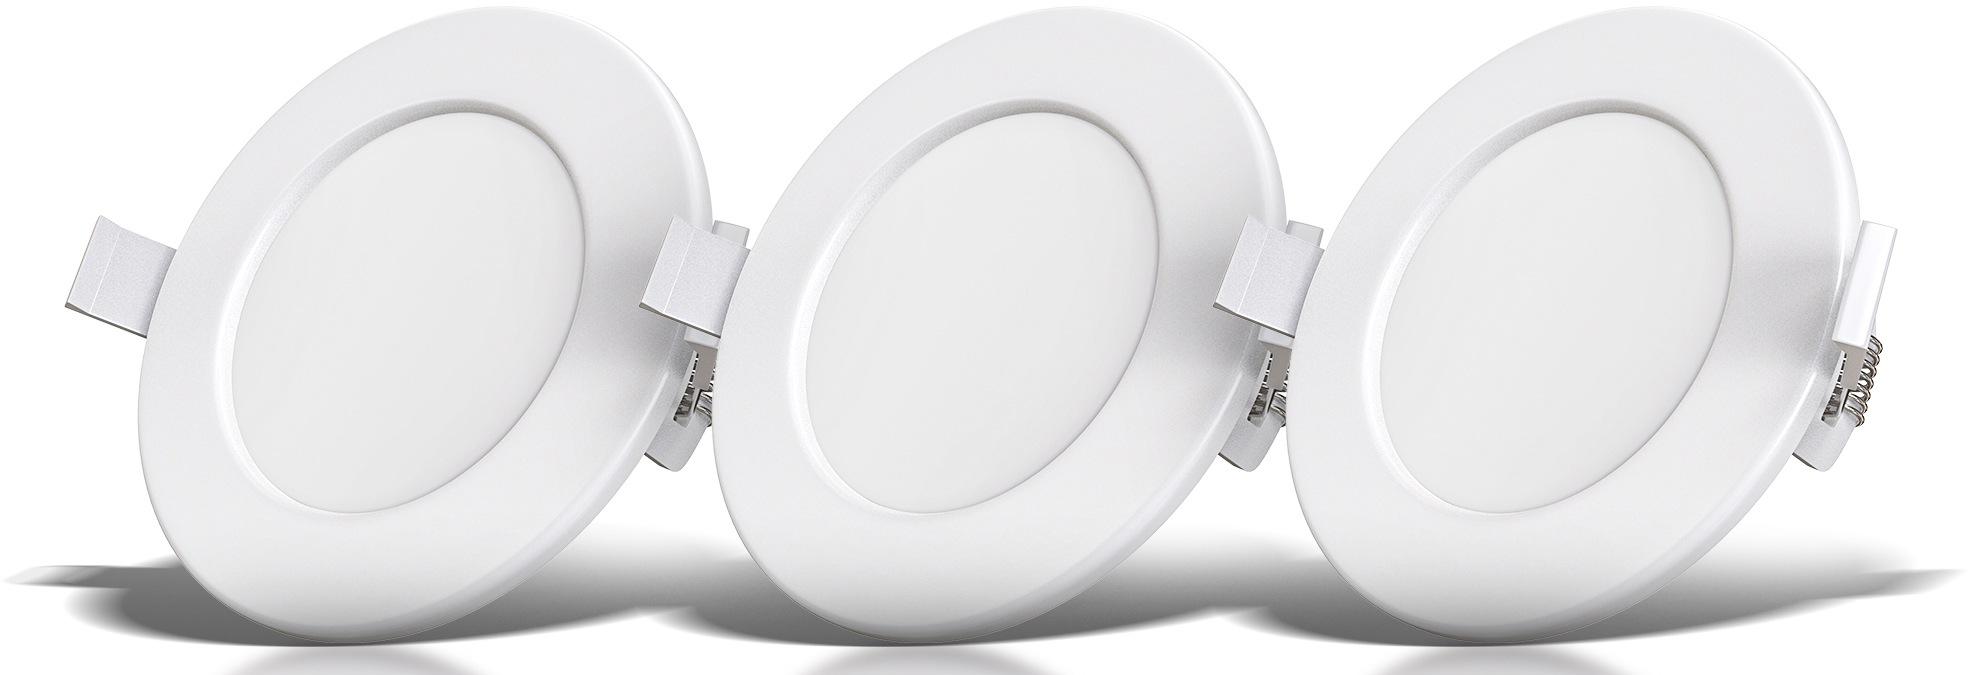 B.K.Licht LED Einbauleuchte, LED-Modul, Warmweiß, LED Einbauspots Bad Einbaustrahler ultra flach inkl. 3x 5W 450LM 3000K IP44